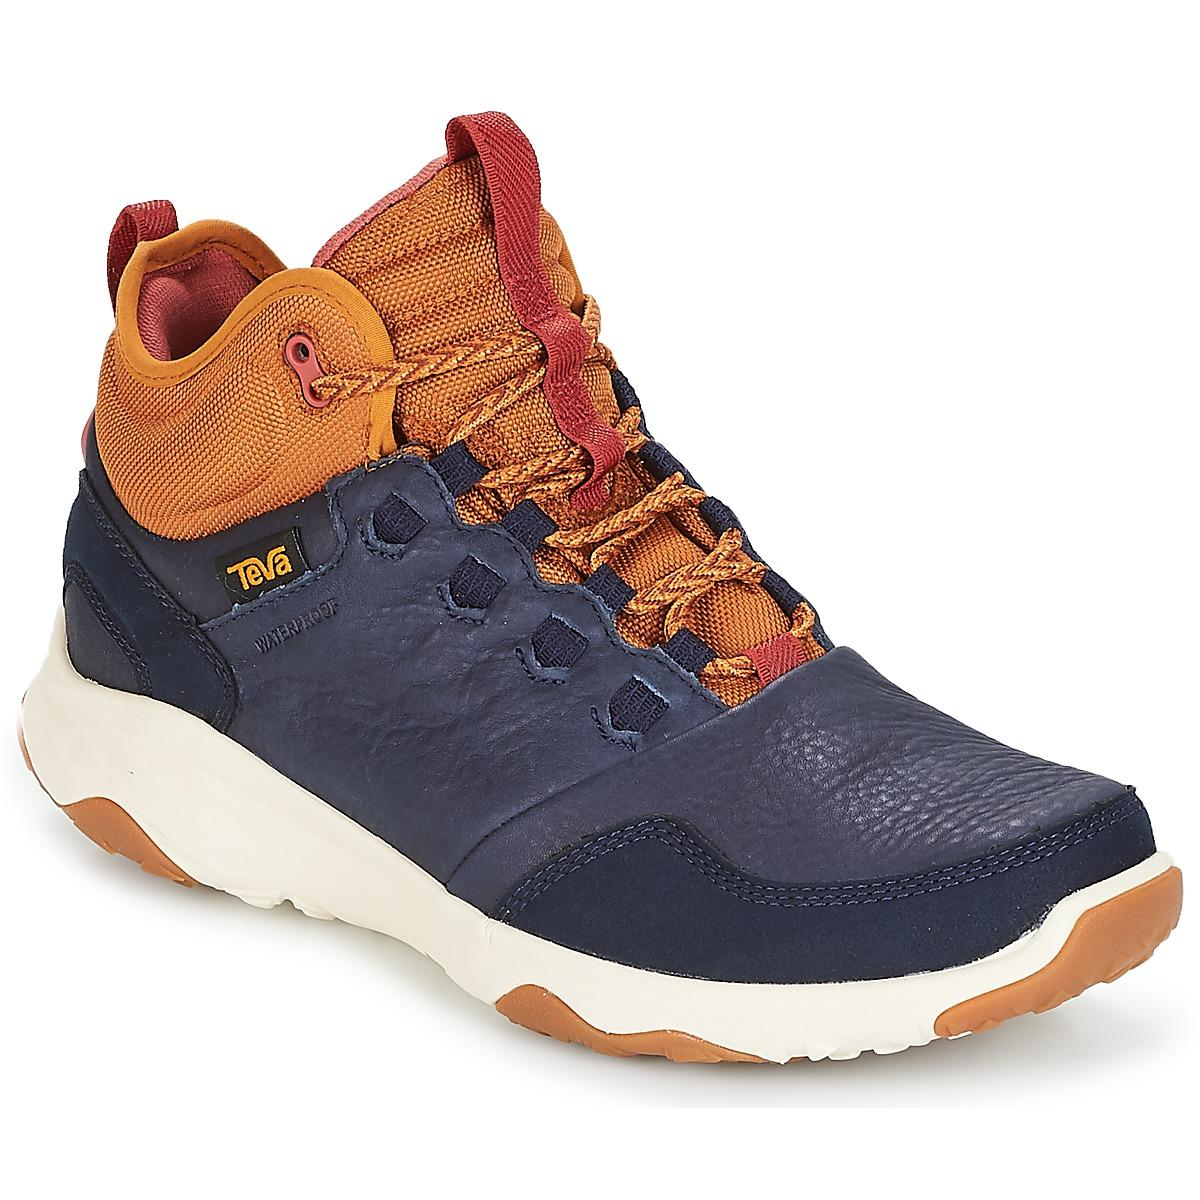 2eab244d28faa6 Teva - Blue Arrowood 2 Mid Wp Shoes (high-top Trainers) for Men. View  fullscreen